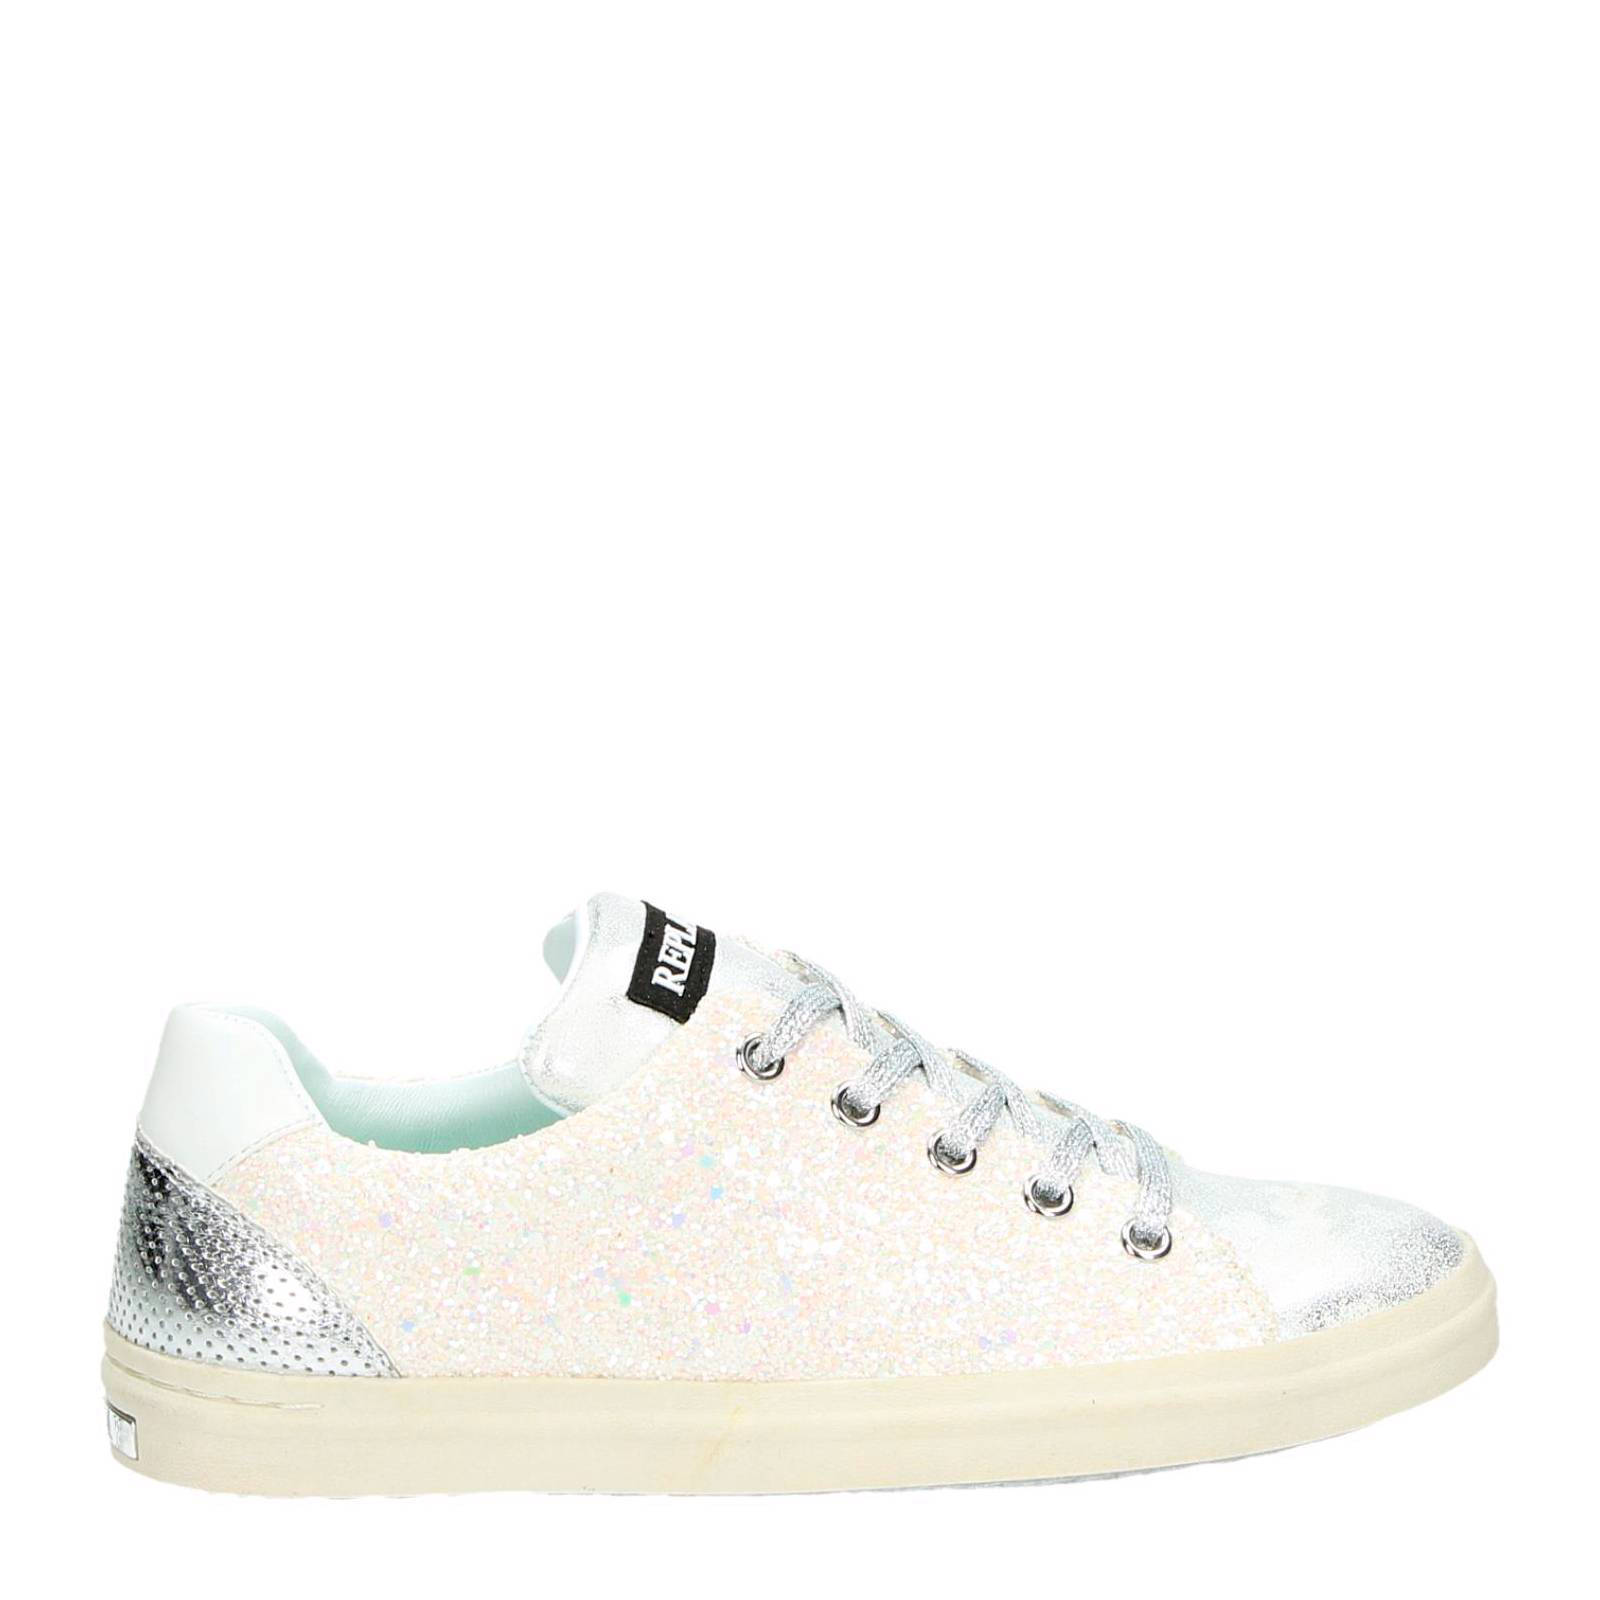 Replay Replay Replay Wehkamp Replay Replay Sneakers Wehkamp Sneakers Sneakers Sneakers Wehkamp Wehkamp fnxCgqU